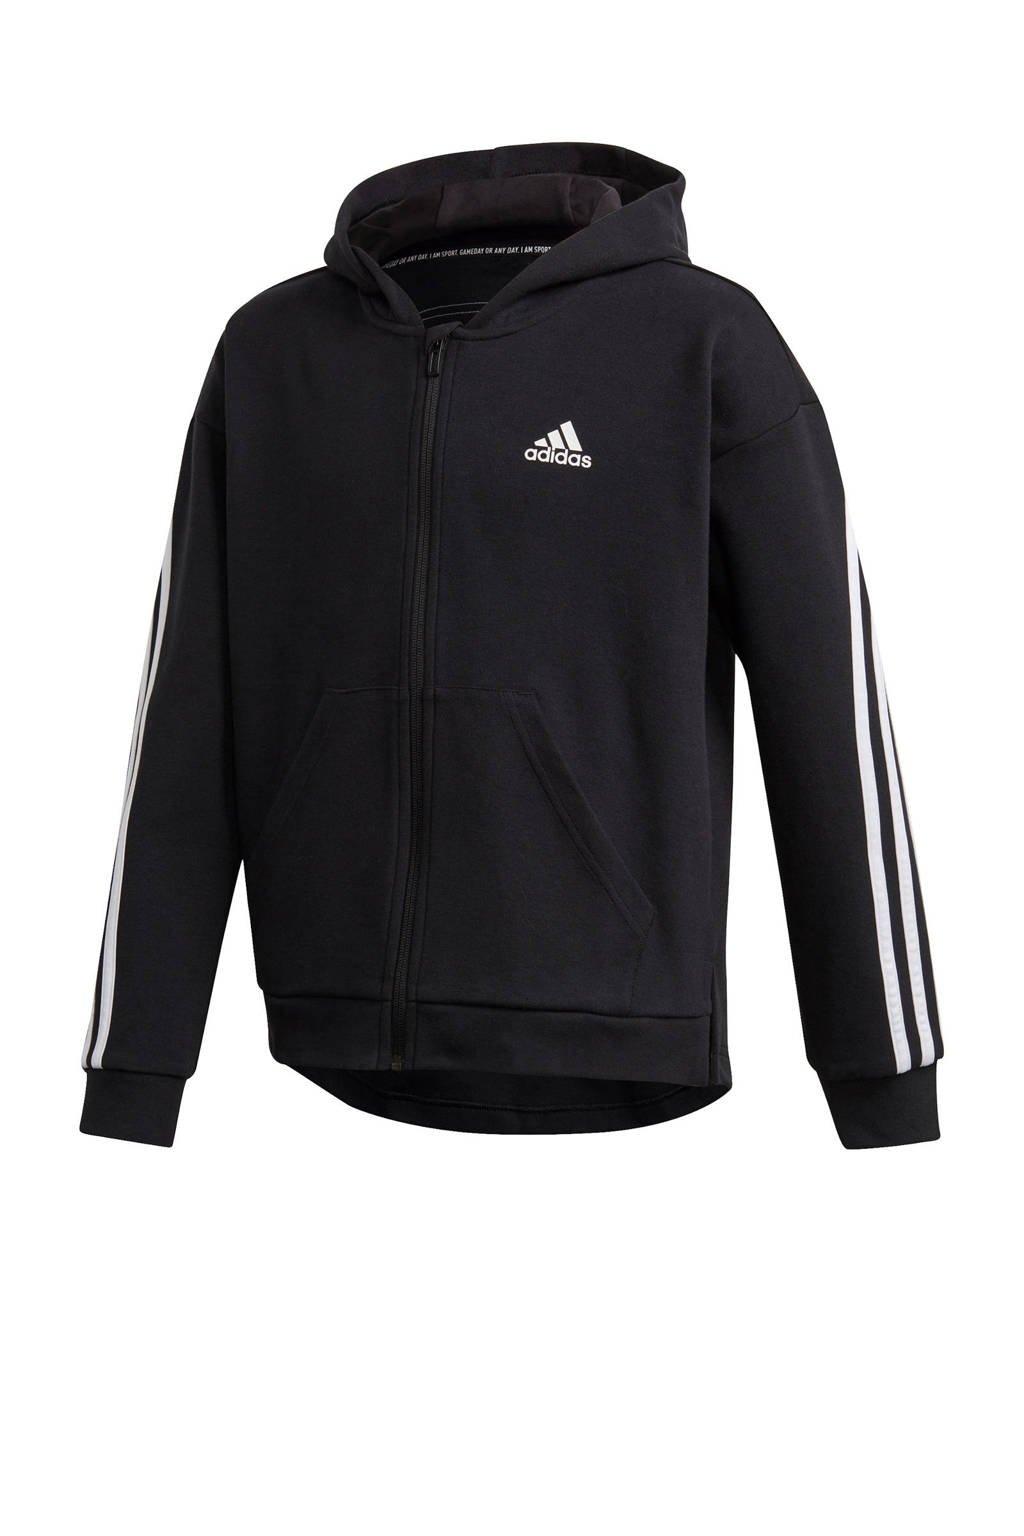 adidas Performance sportvest zwart/wit, Zwart/wit